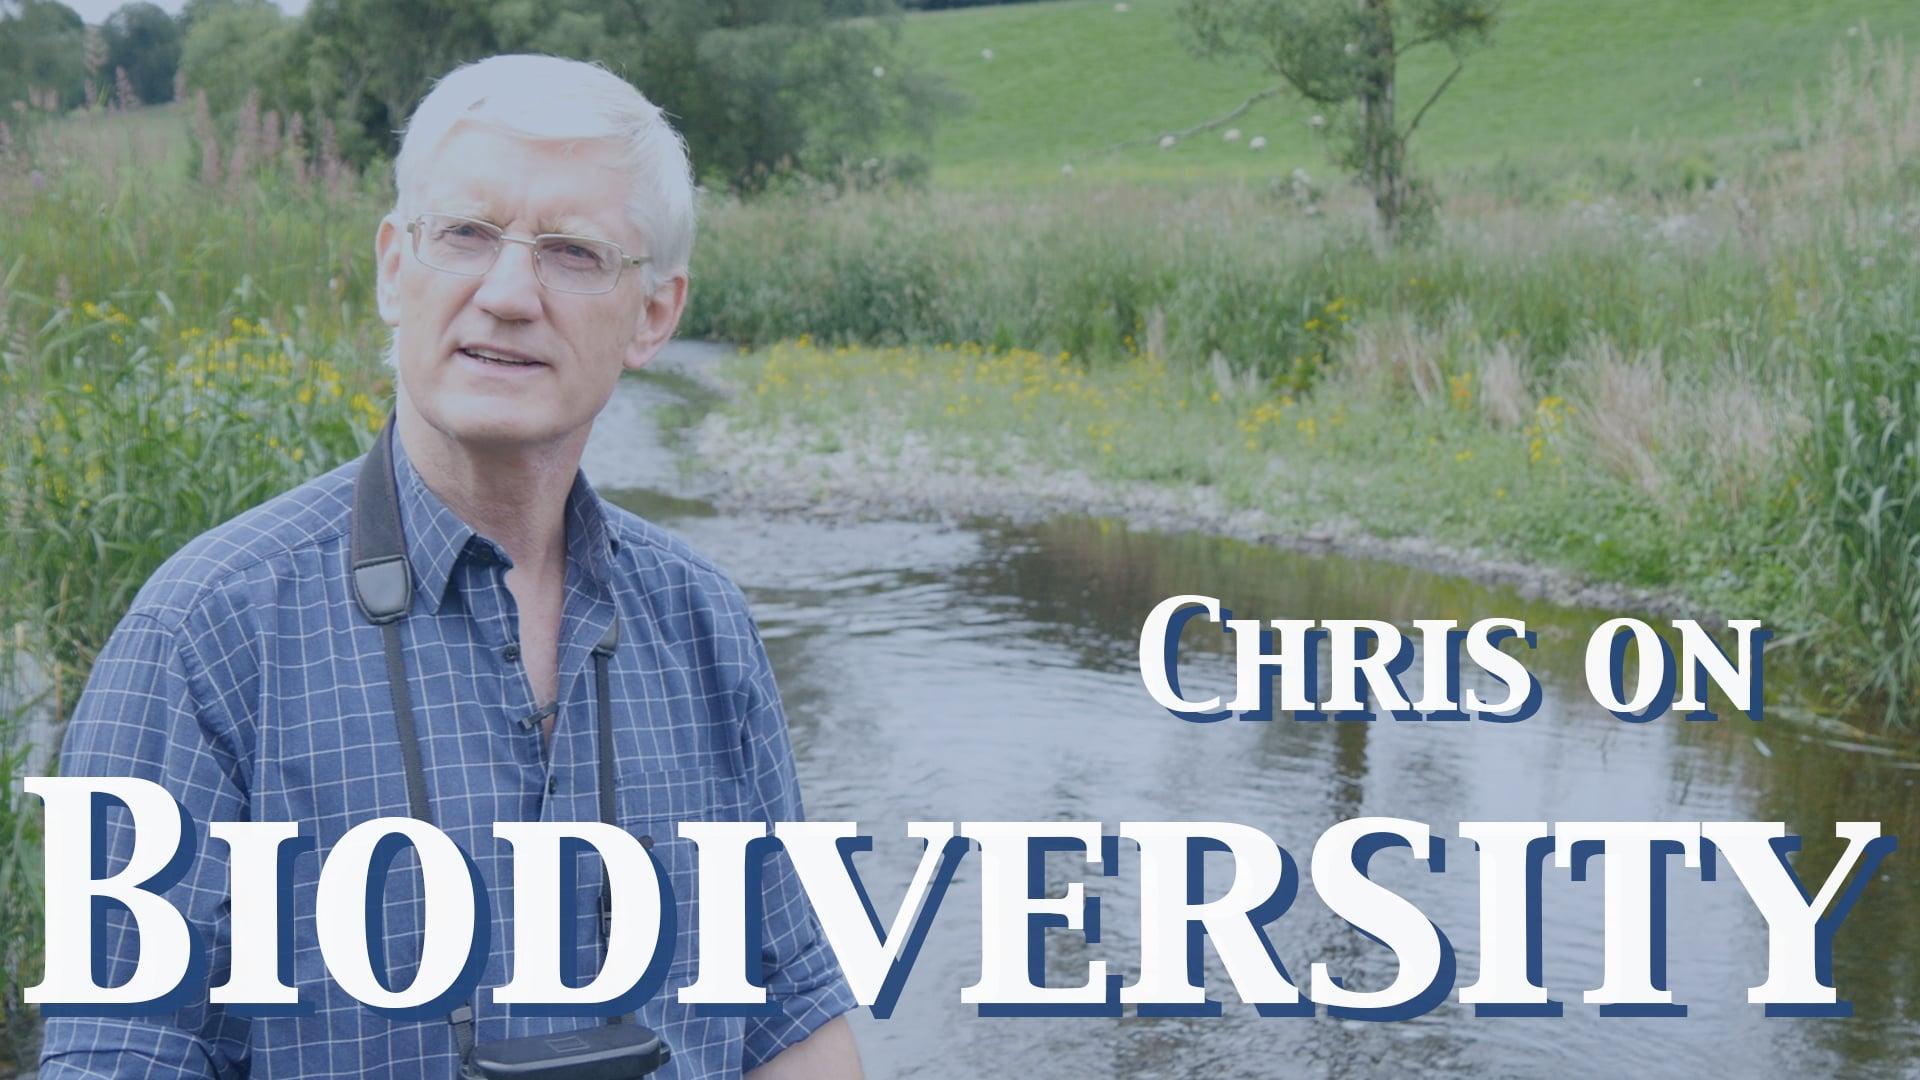 Chris on Biodiversity